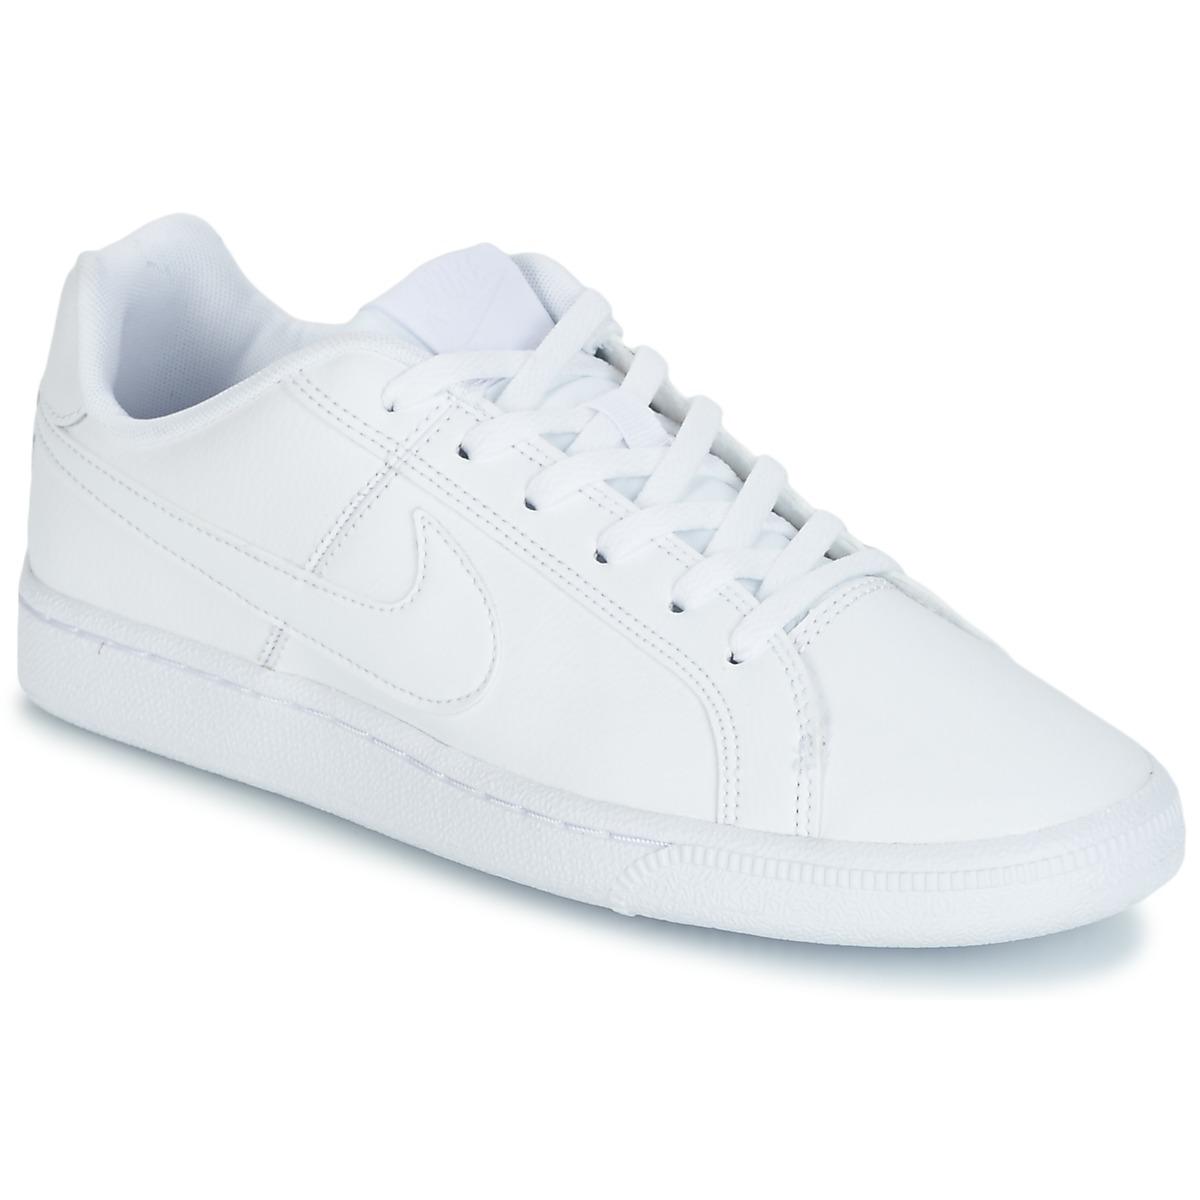 afaae6b90a4 Nike COURT ROYALE GRADE SCHOOL Hvid - Gratis fragt   Spartoo.dk ! - Sko  Lave sneakers Barn 311,00 Kr